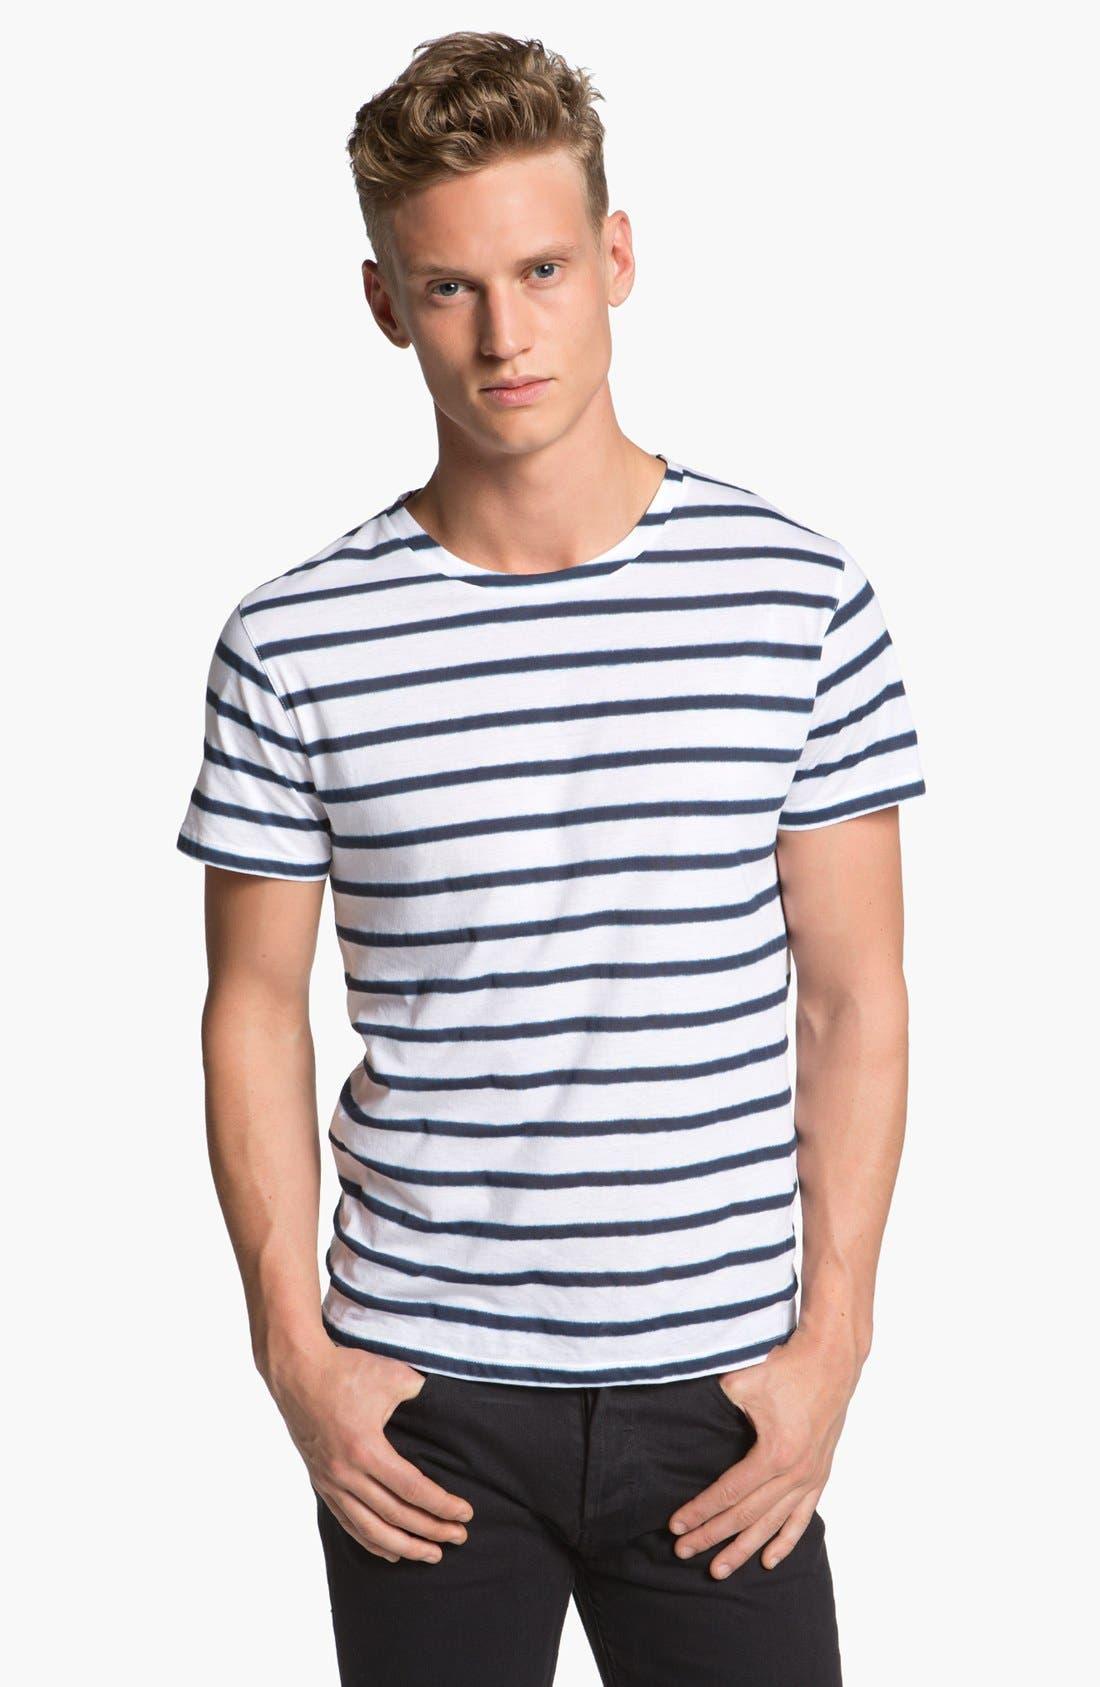 Alternate Image 1 Selected - A.P.C. Stripe Crewneck T-Shirt